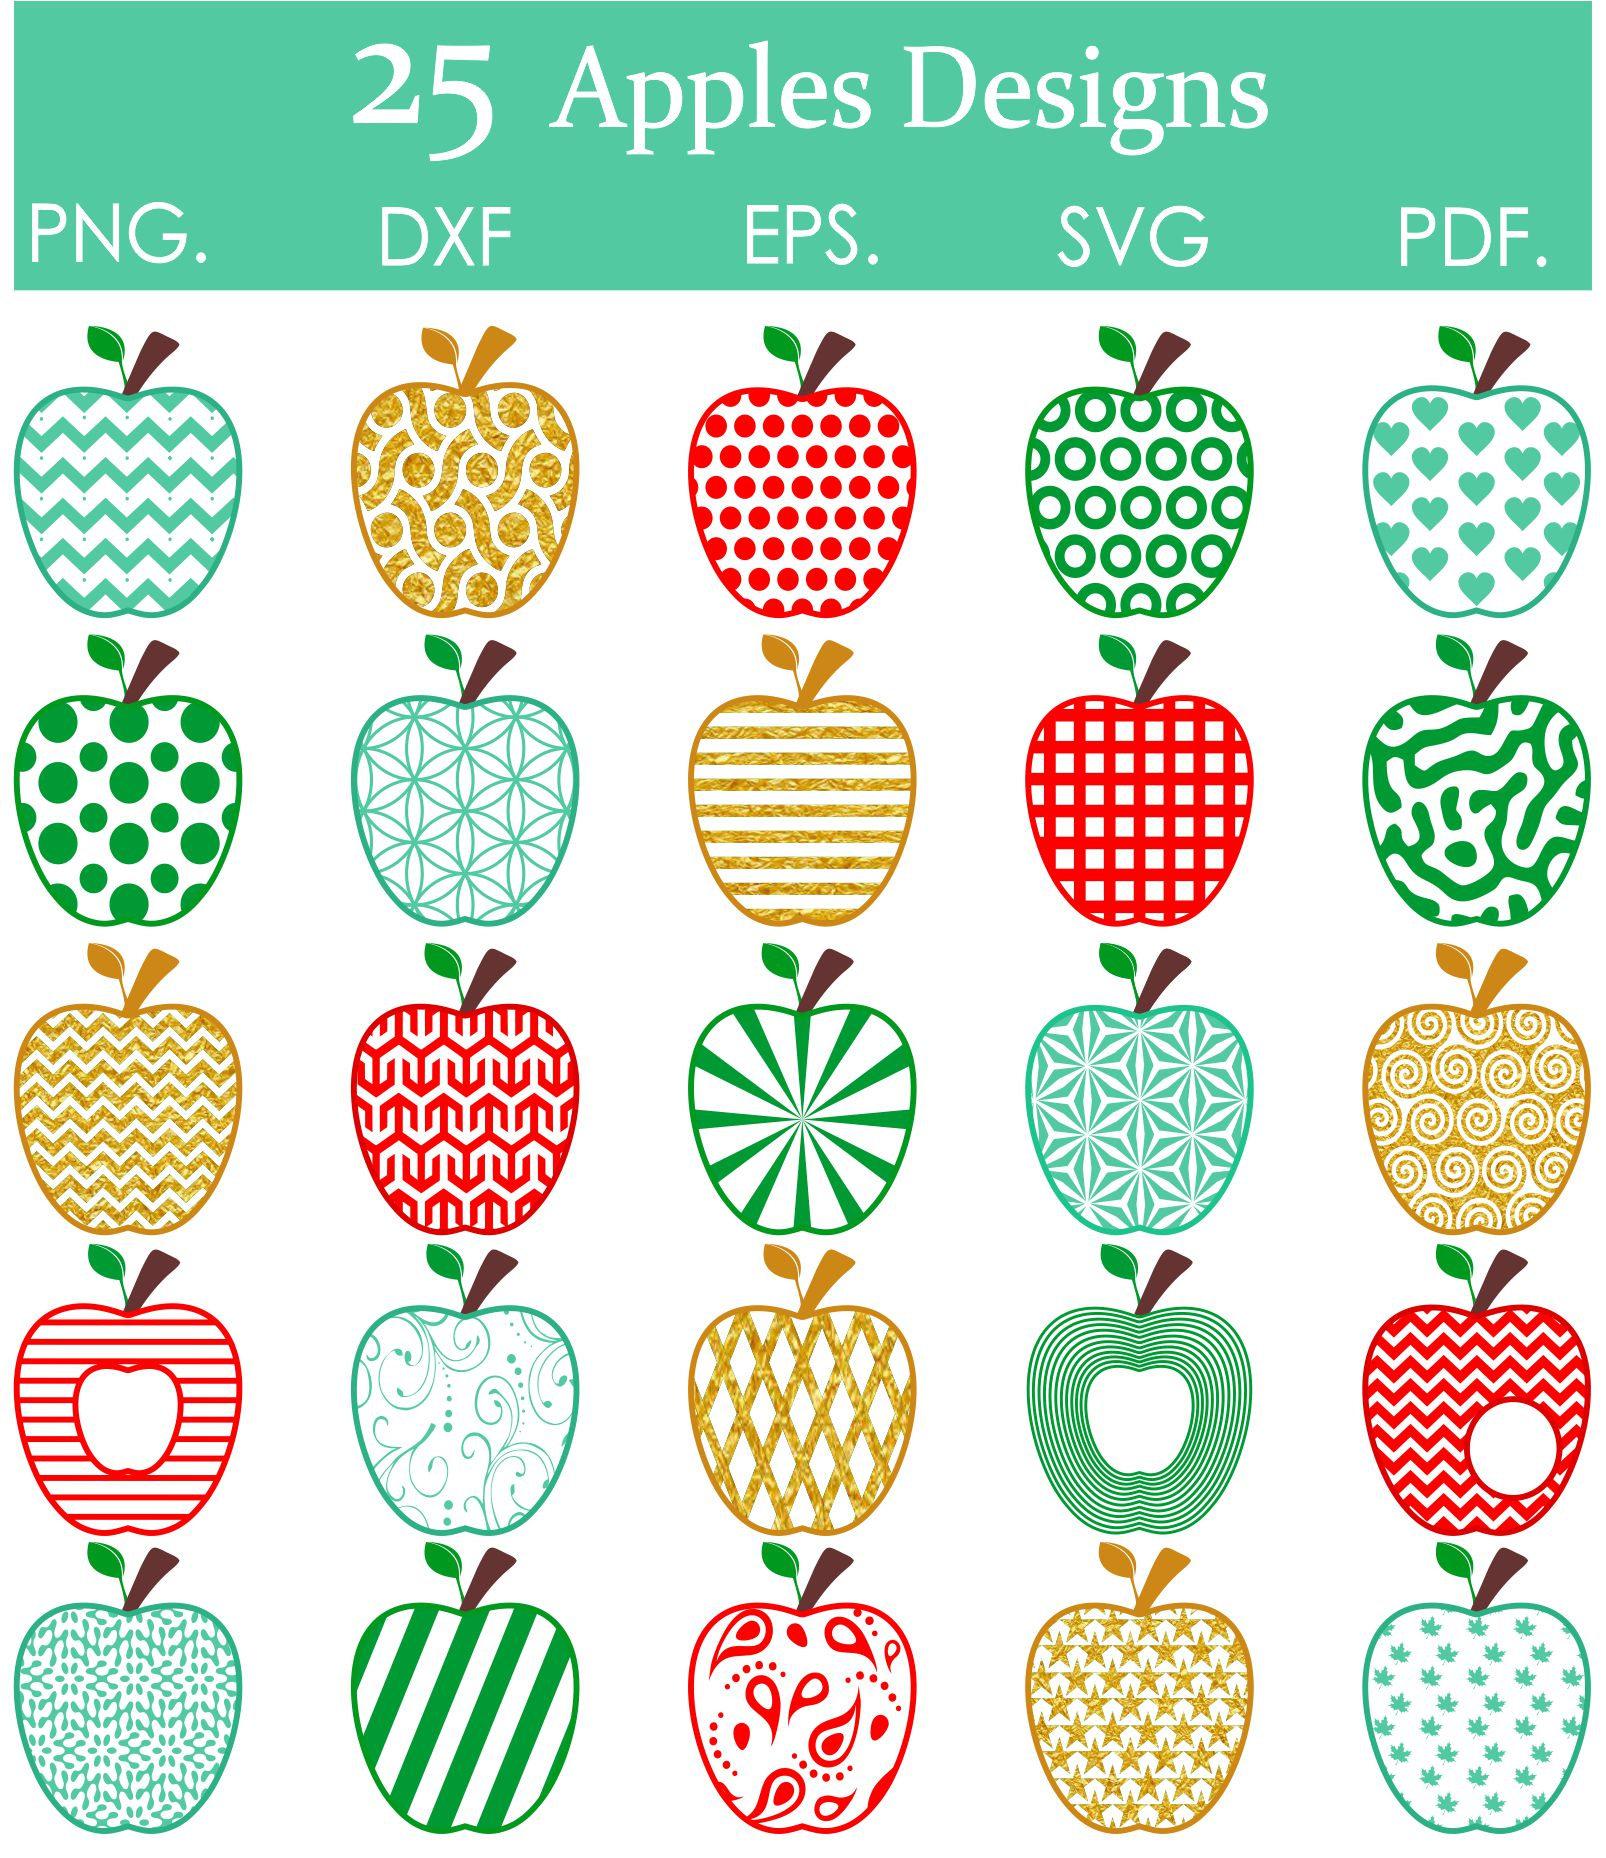 Apple clipart 25 DESIGNES 100 images. Svg eps pdf png   Etsy